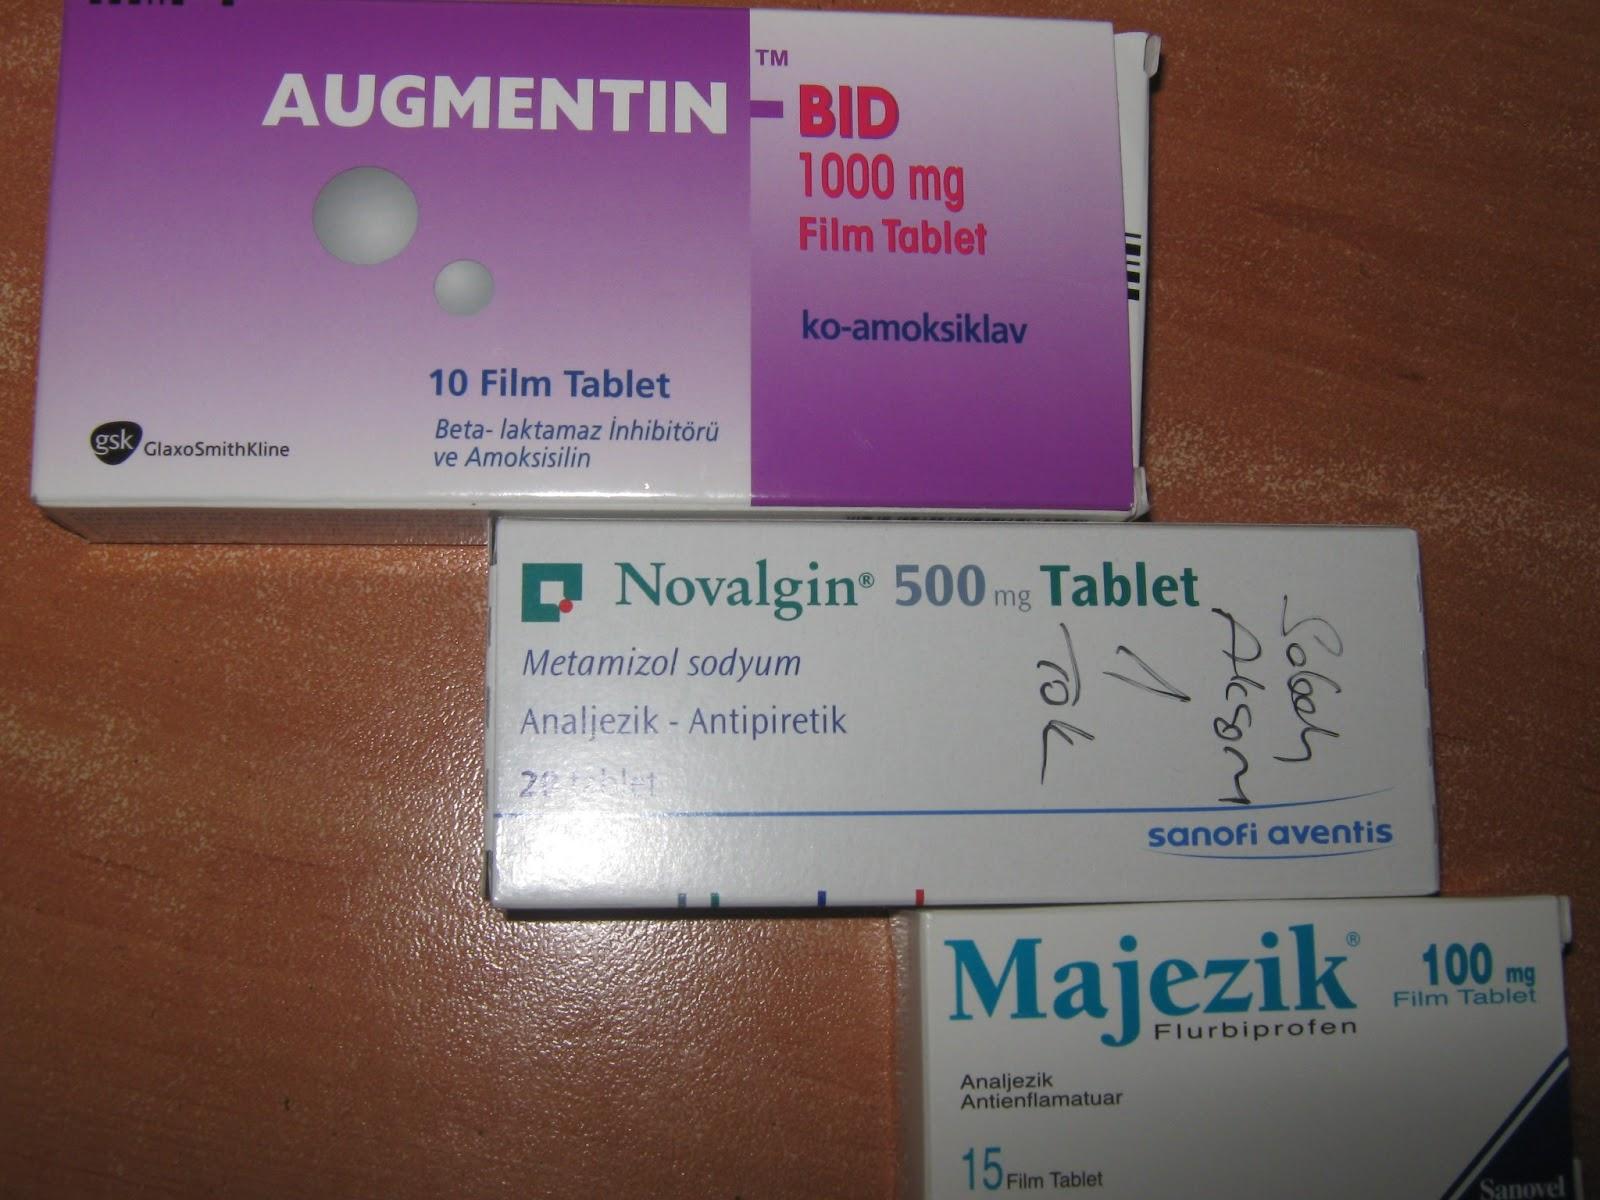 augmentin - suslusozluk.com